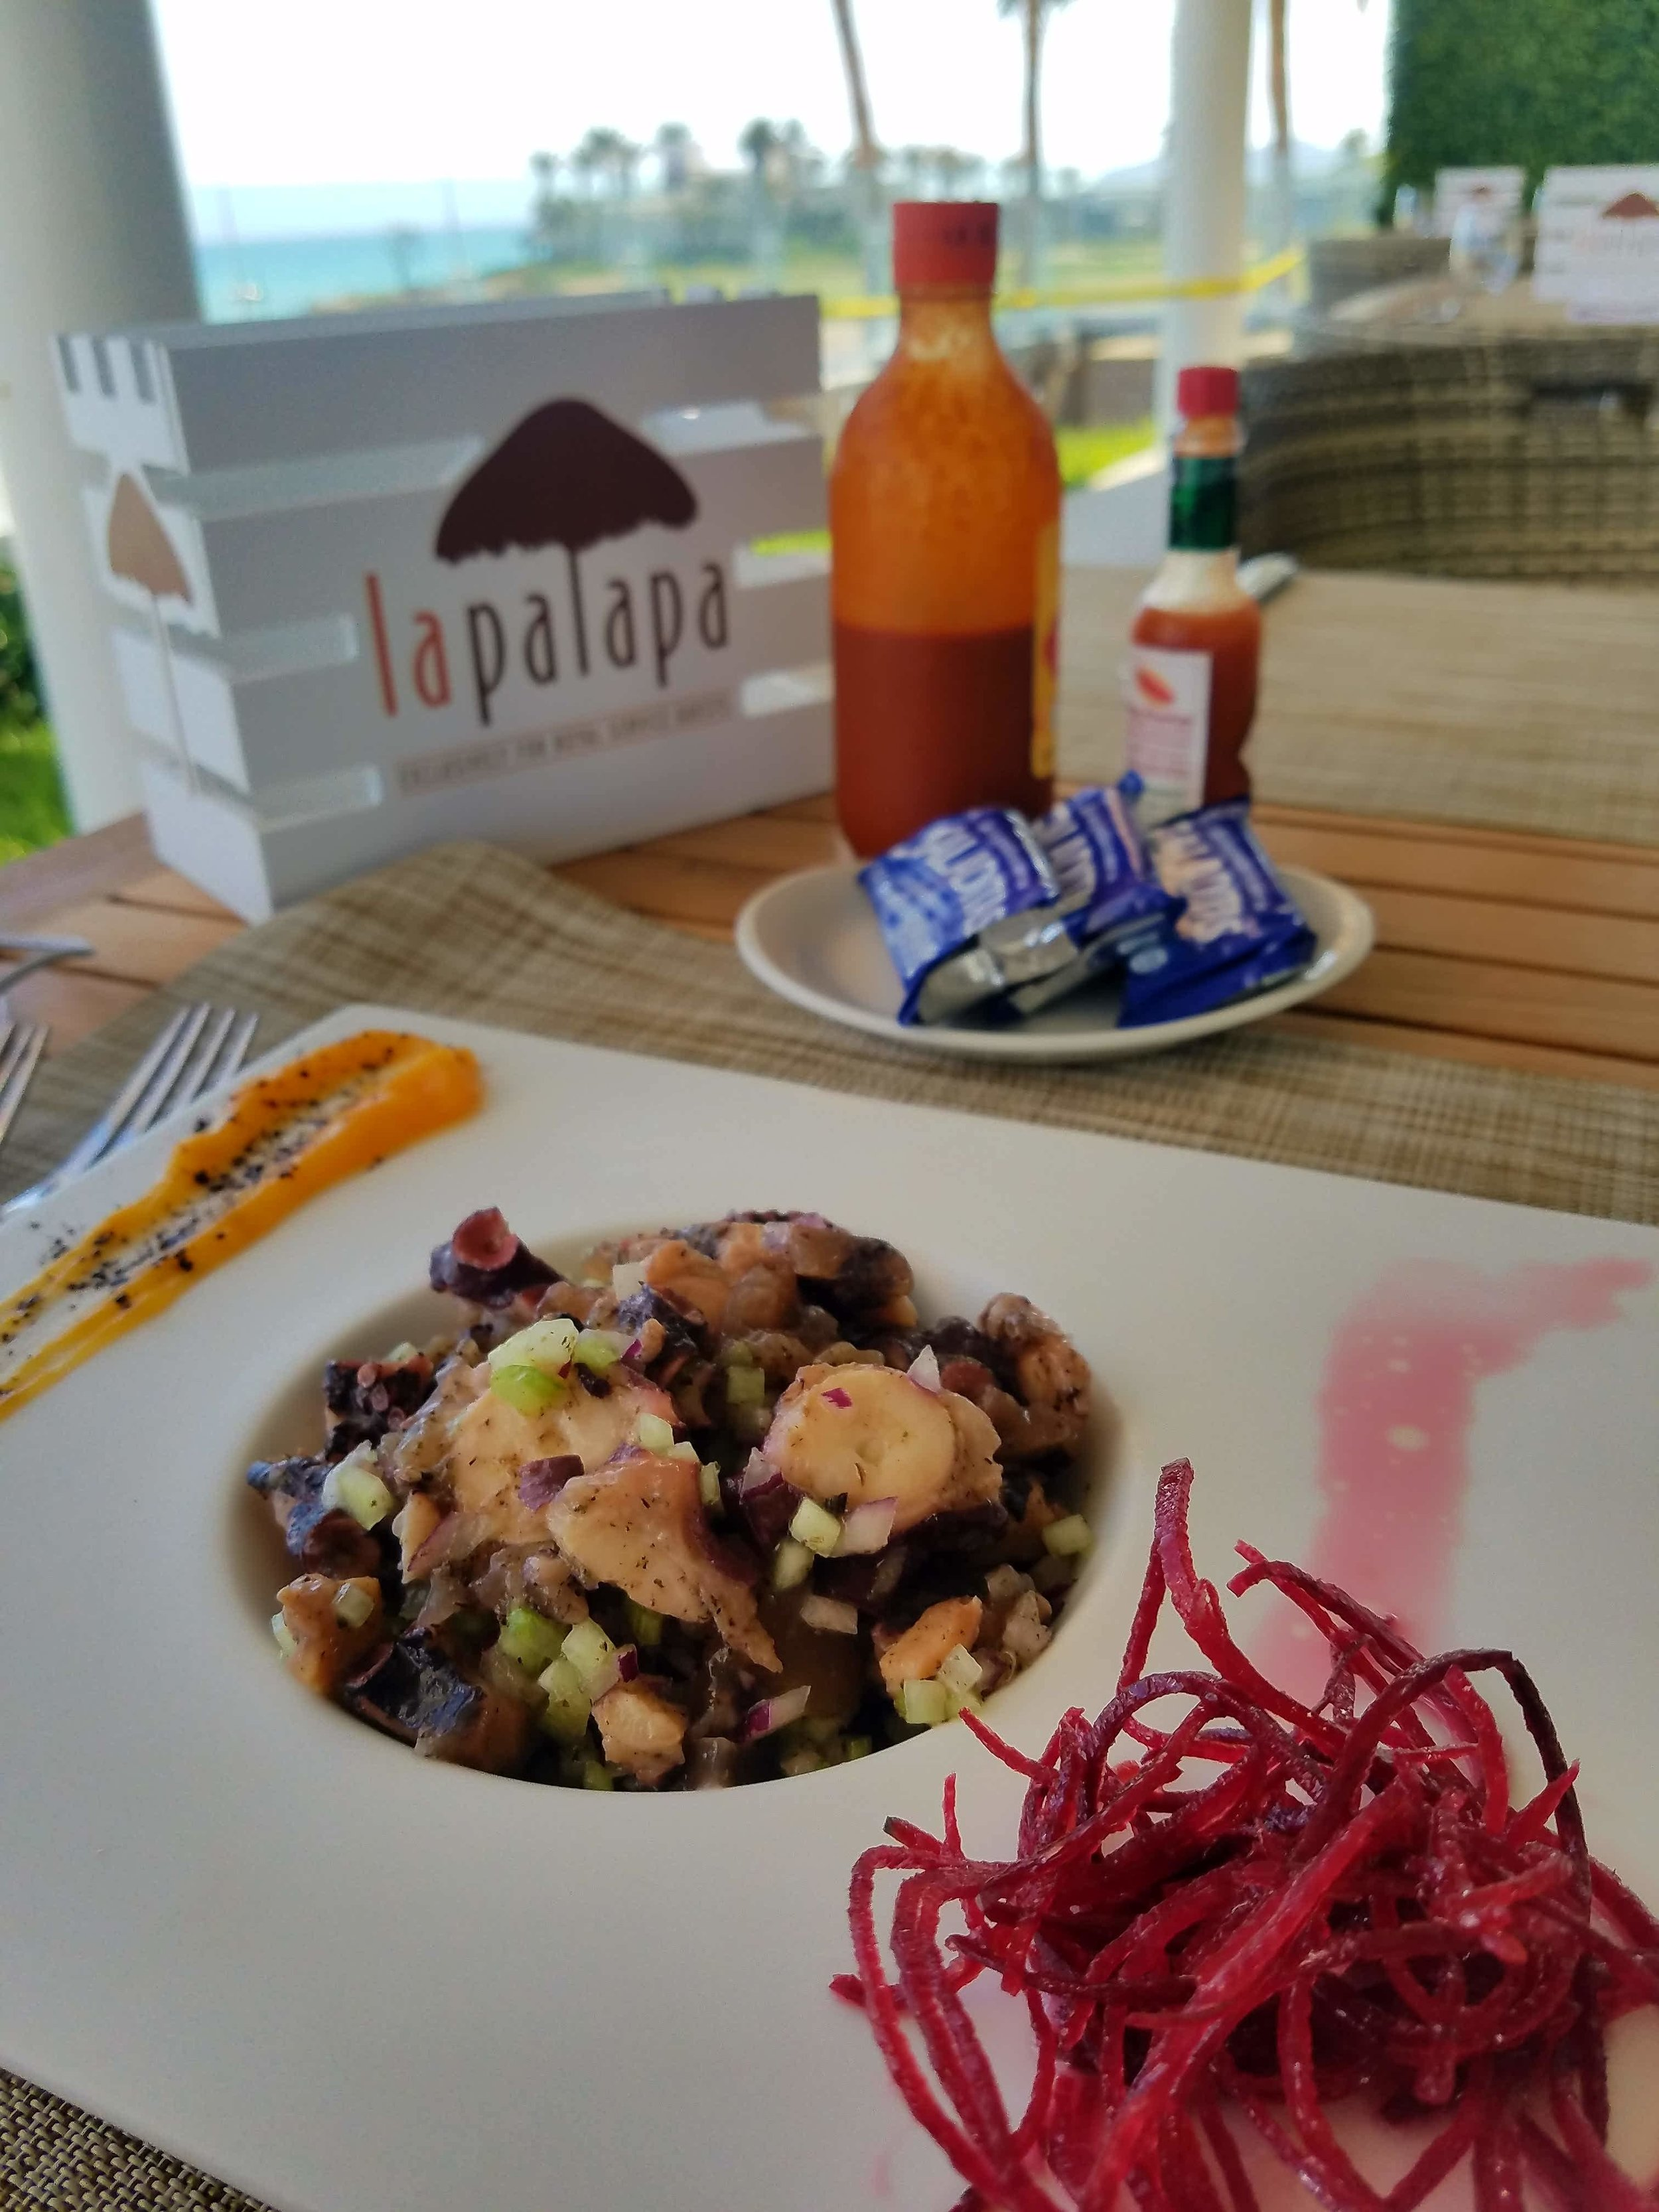 Octopus Ceviche at La Palapa